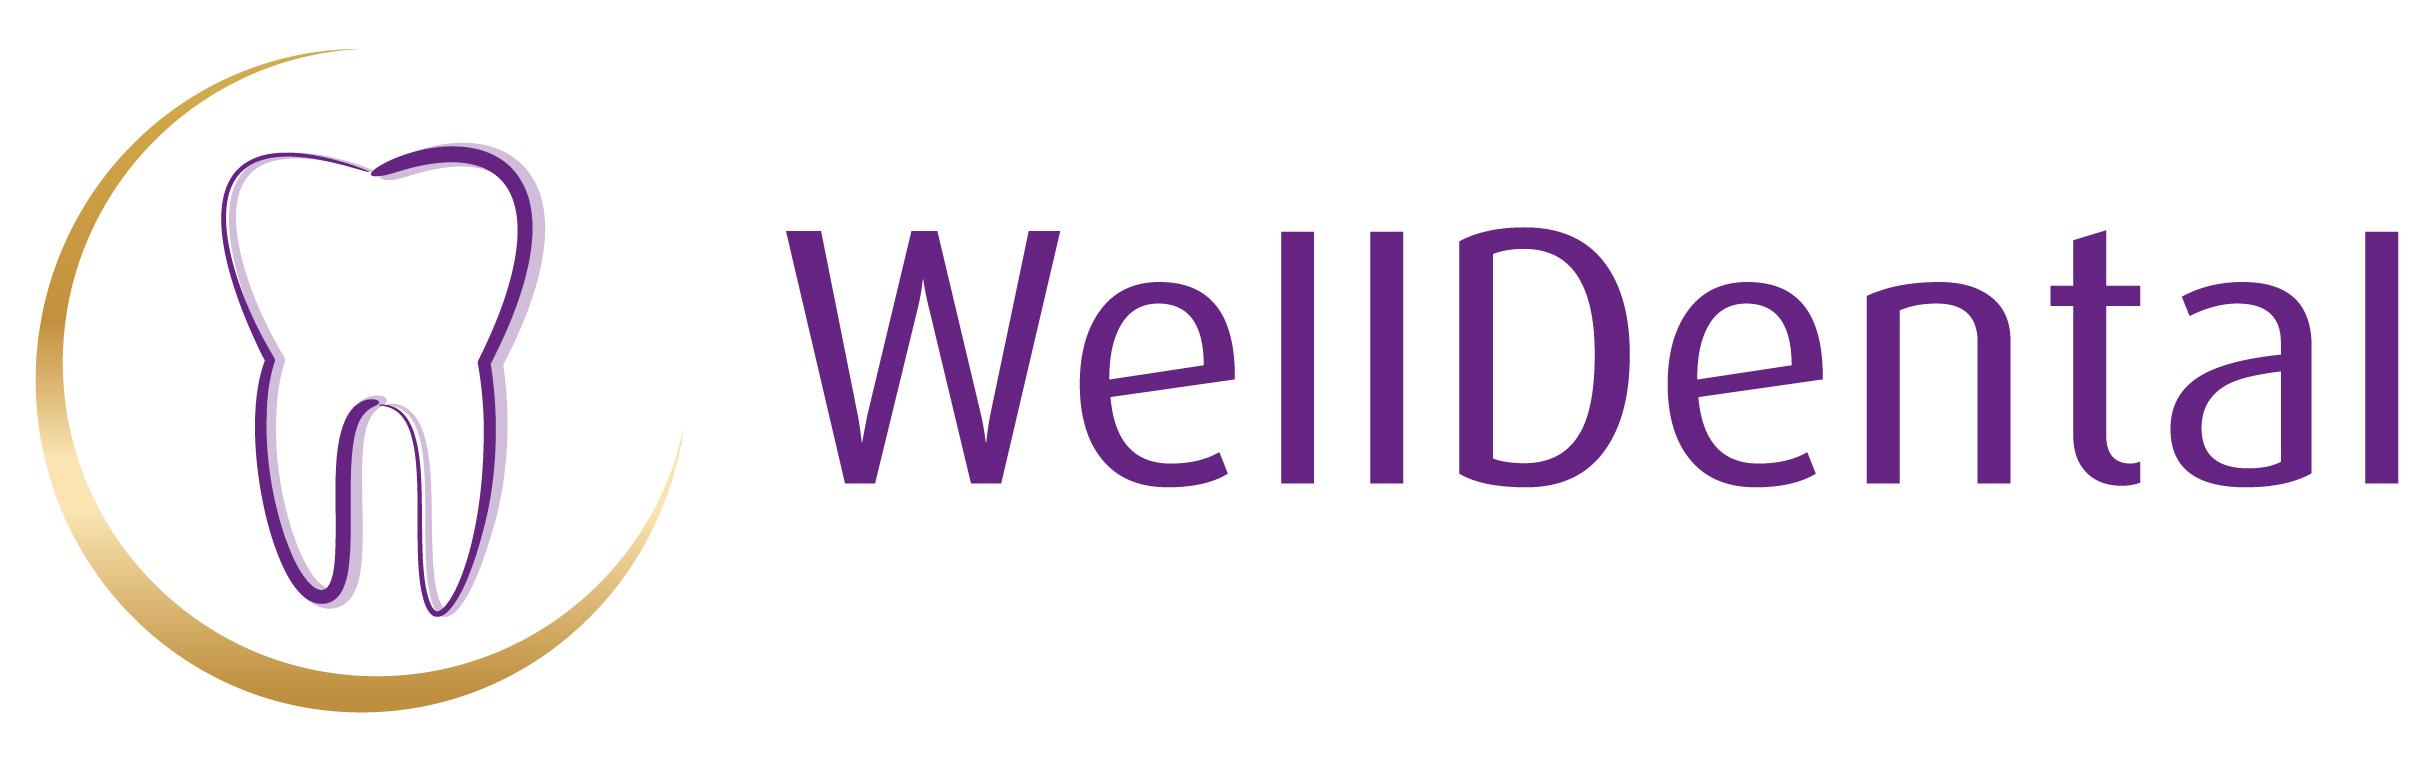 welldental.jpg